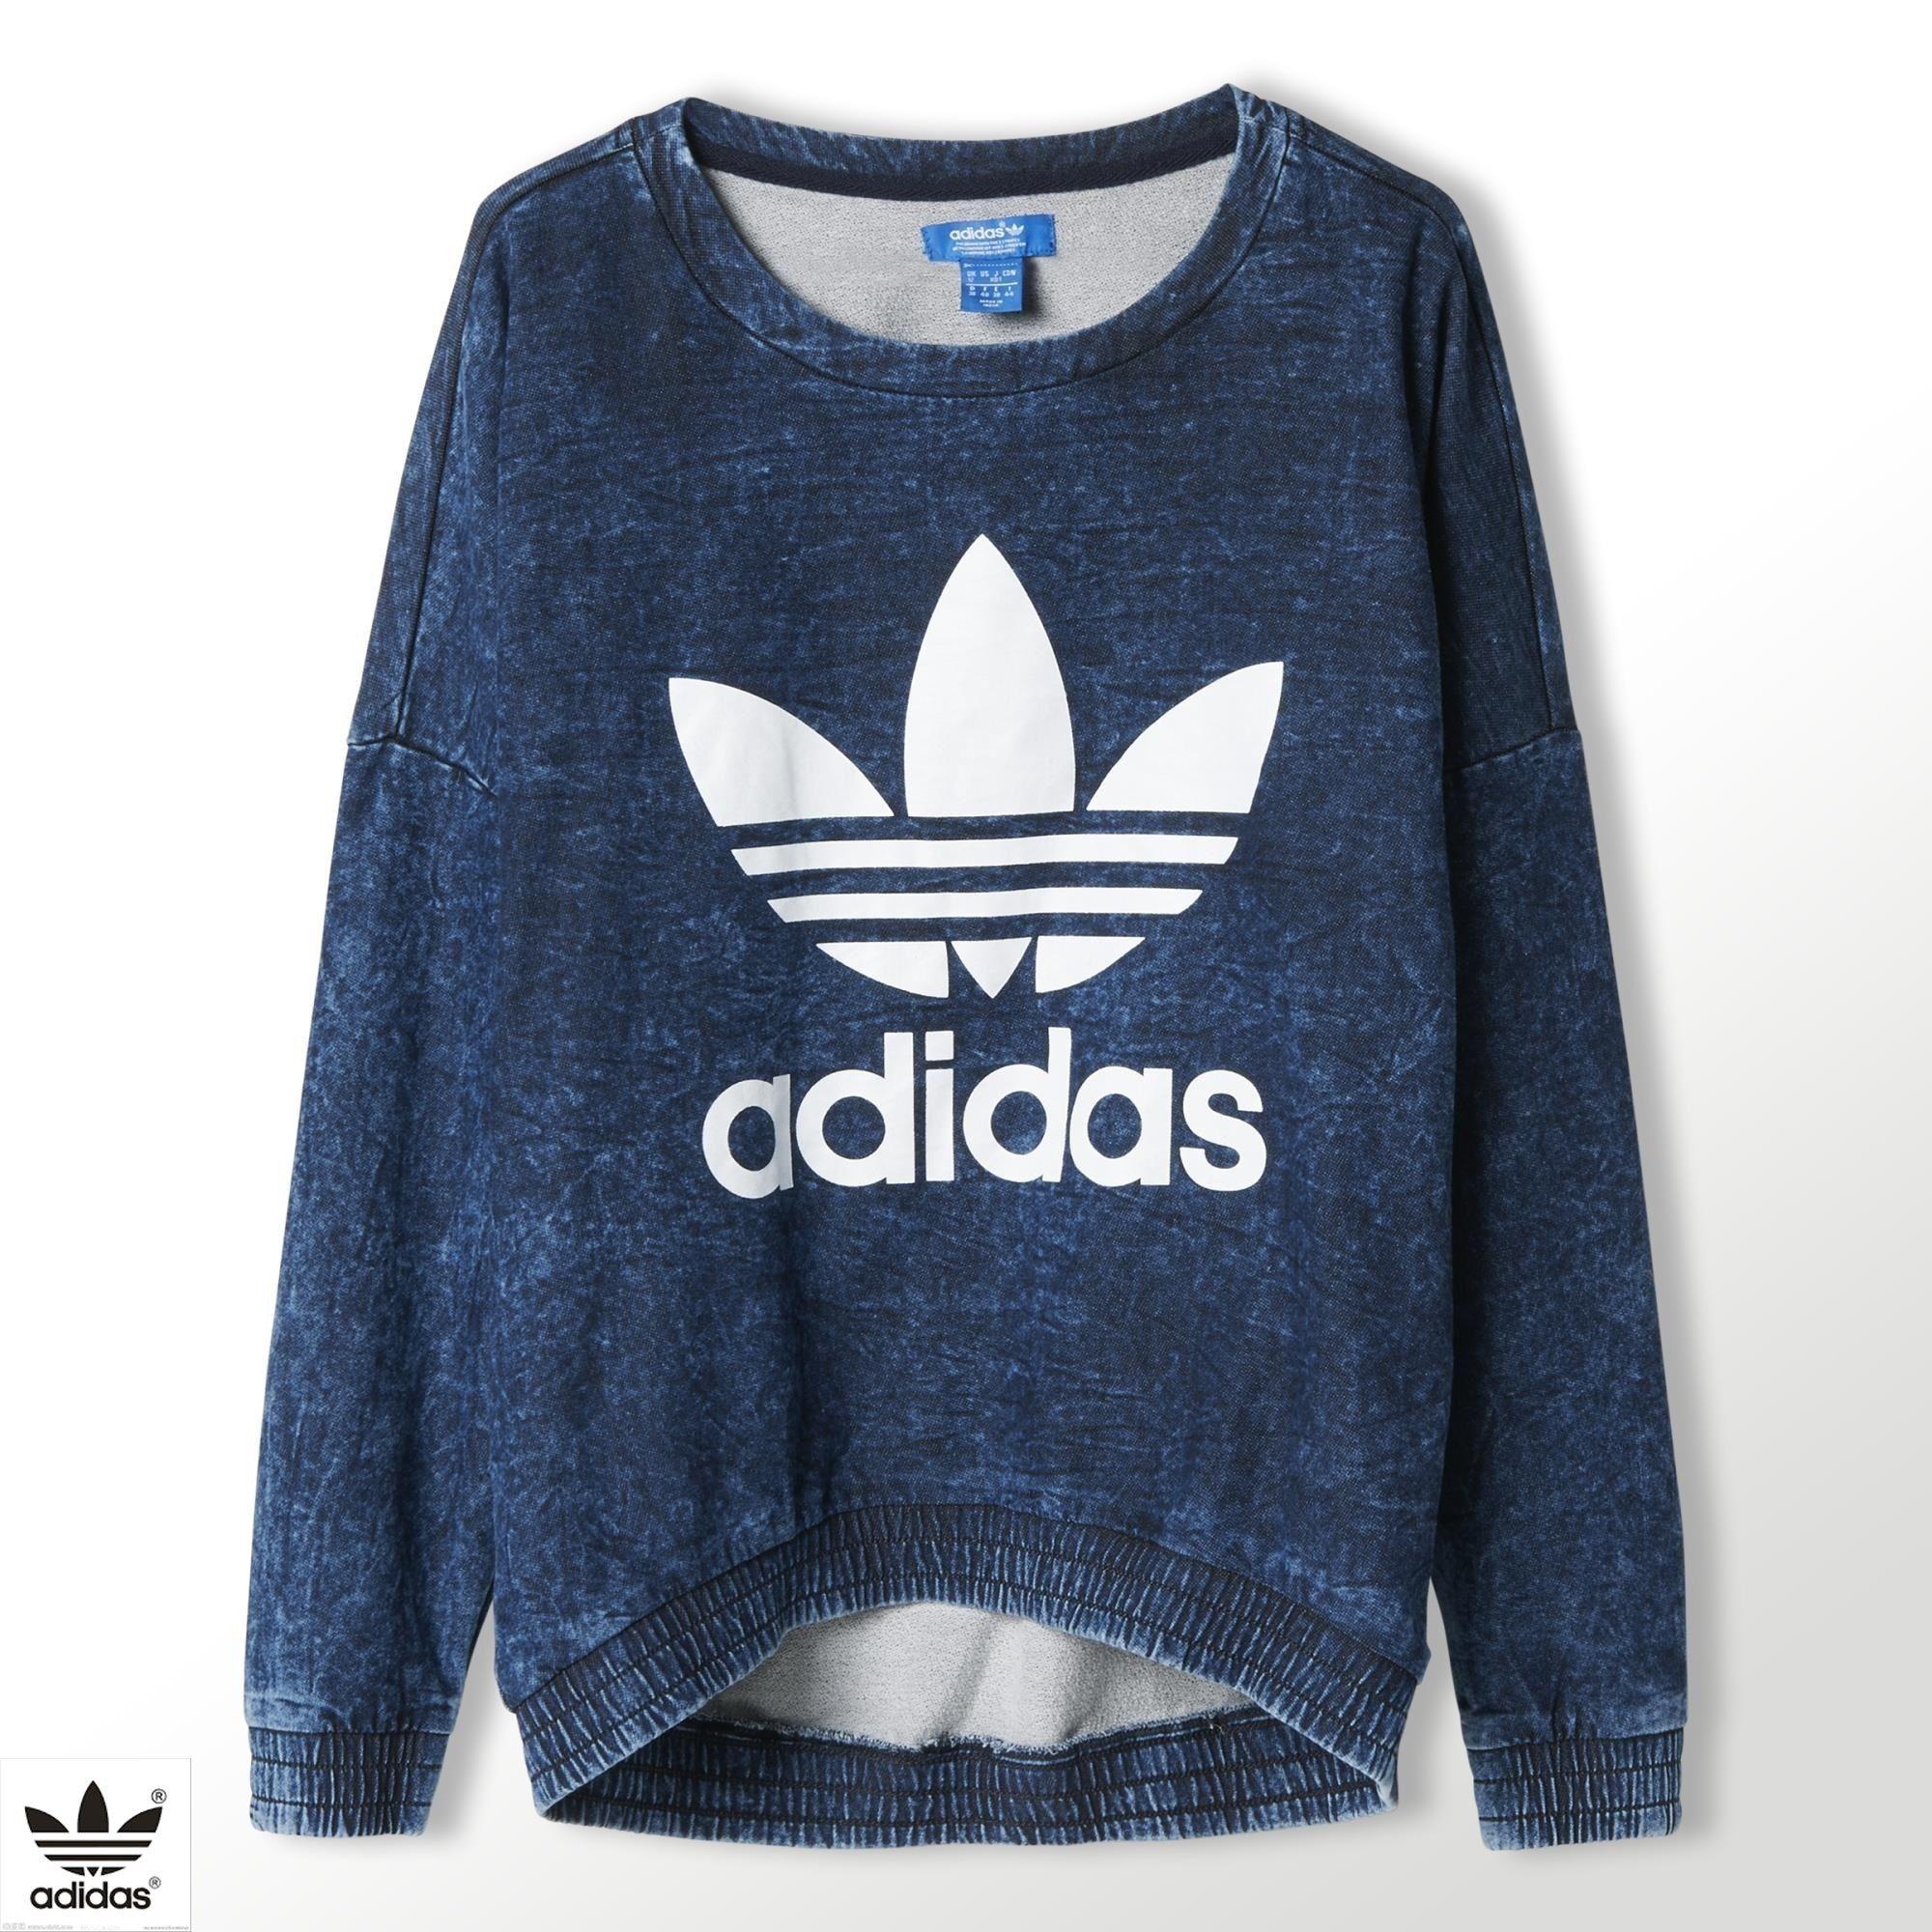 billig adidas sweatshirt